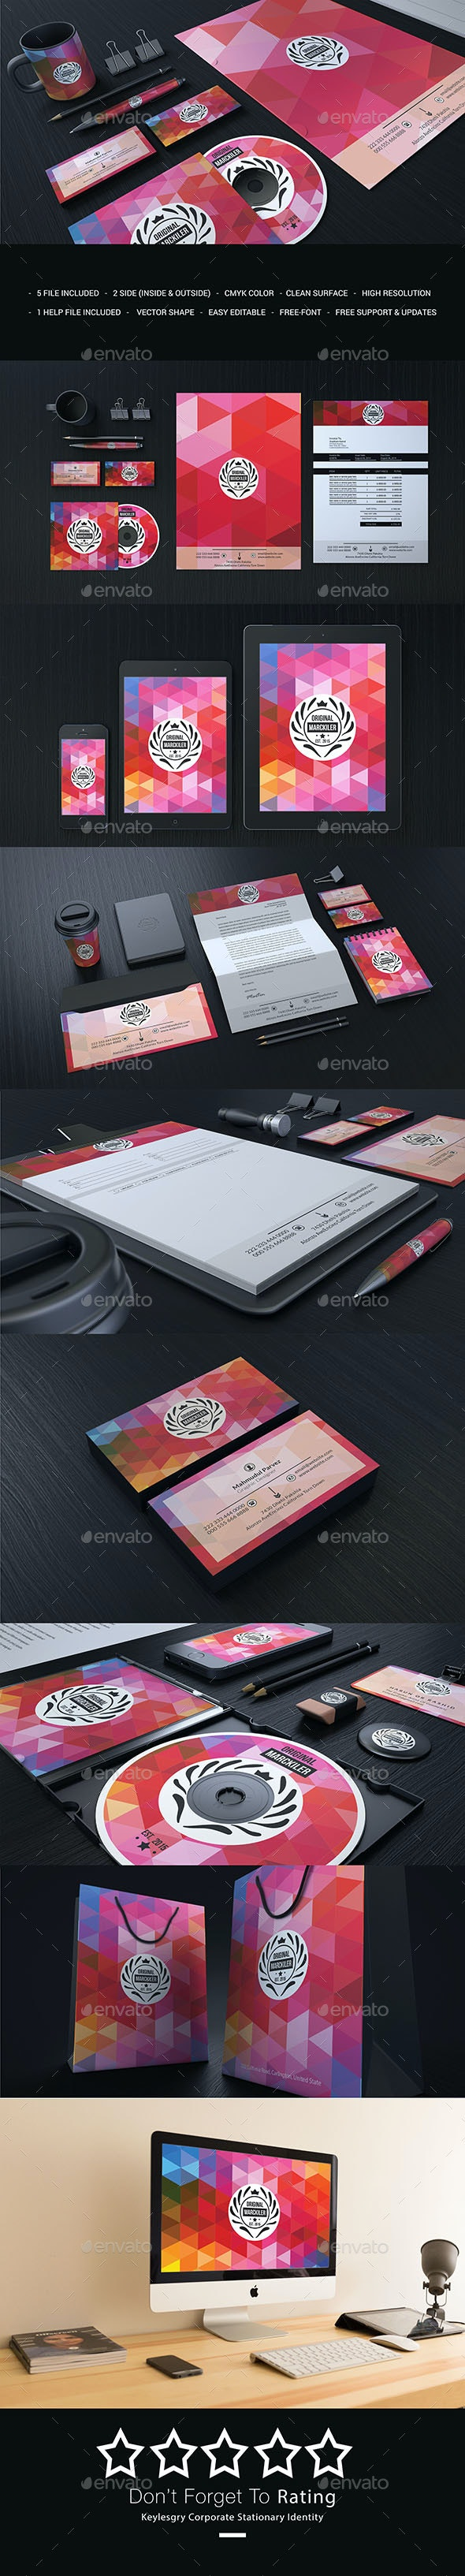 Coluared Corporate Branding Identity - Stationery Print Templates